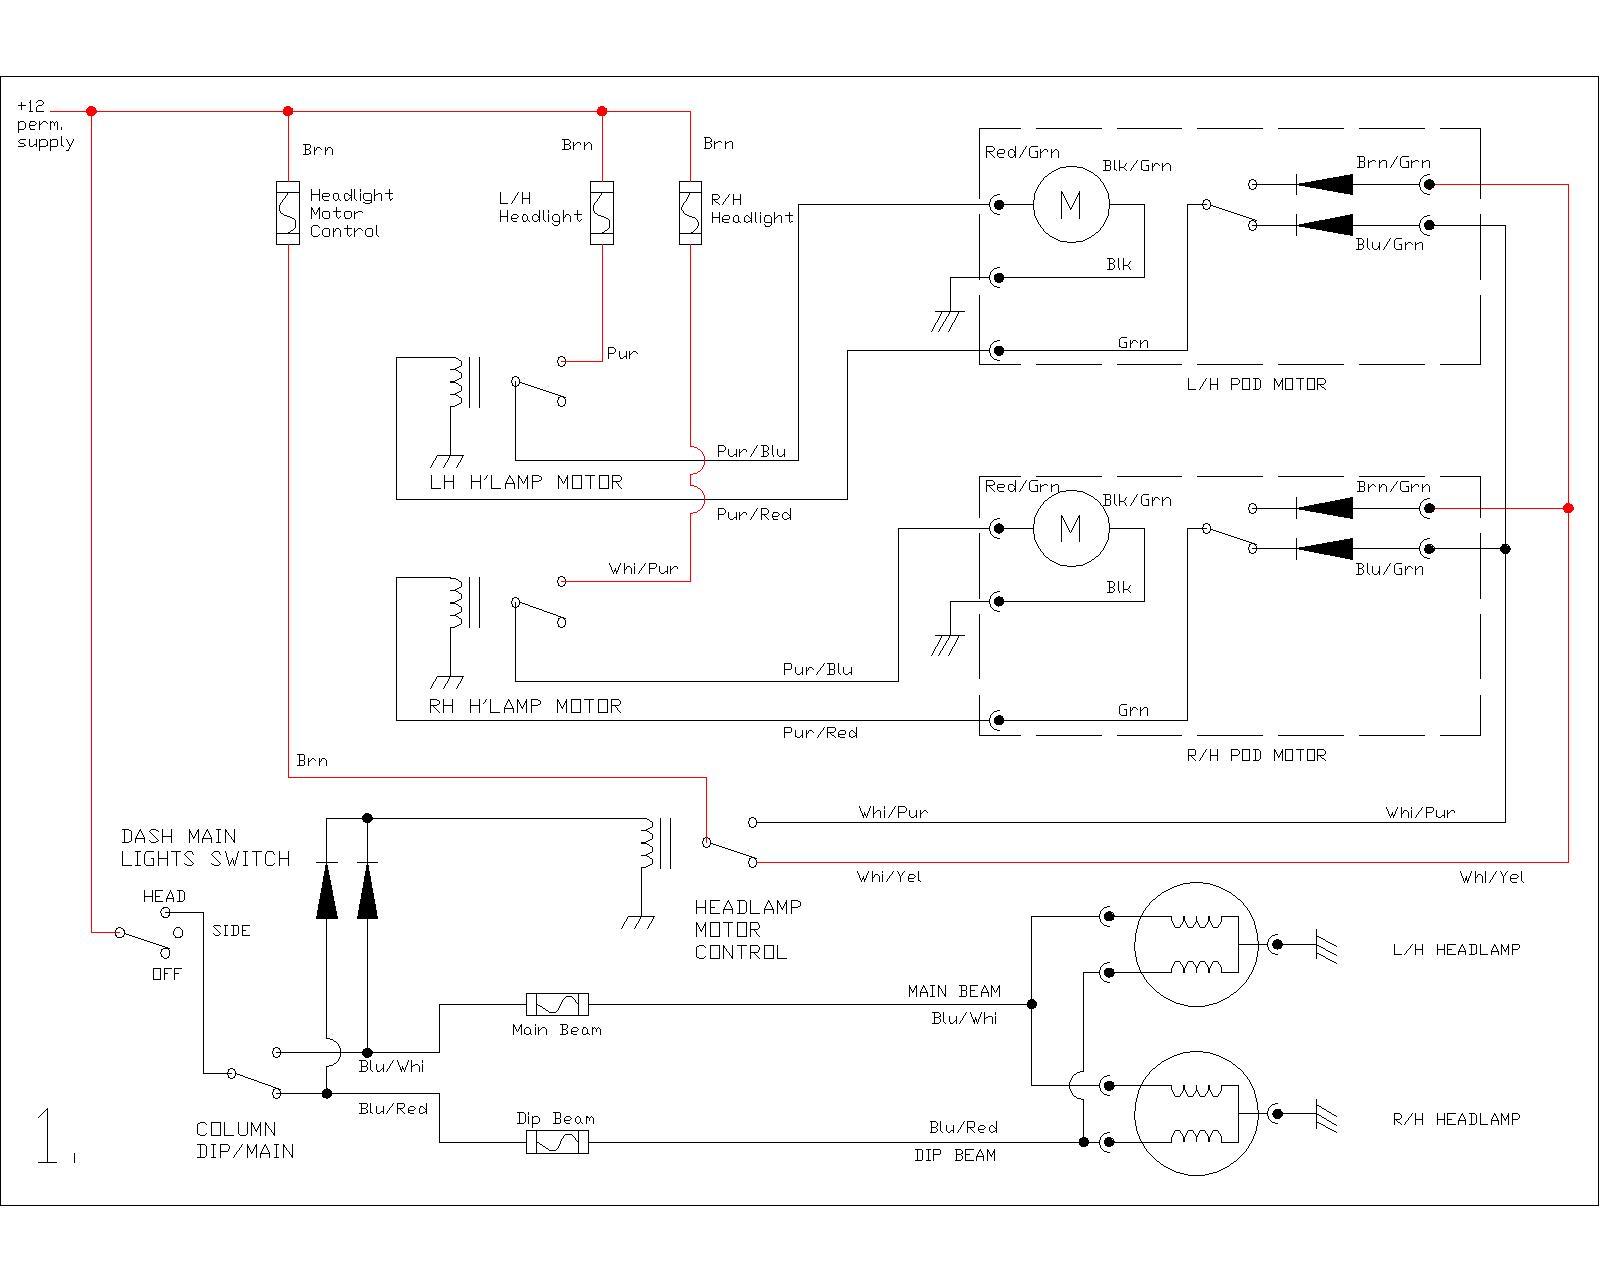 tvr 390se p6 2003 ford e450 headlight wiring diagram tr7 headlight wiring diagram #6